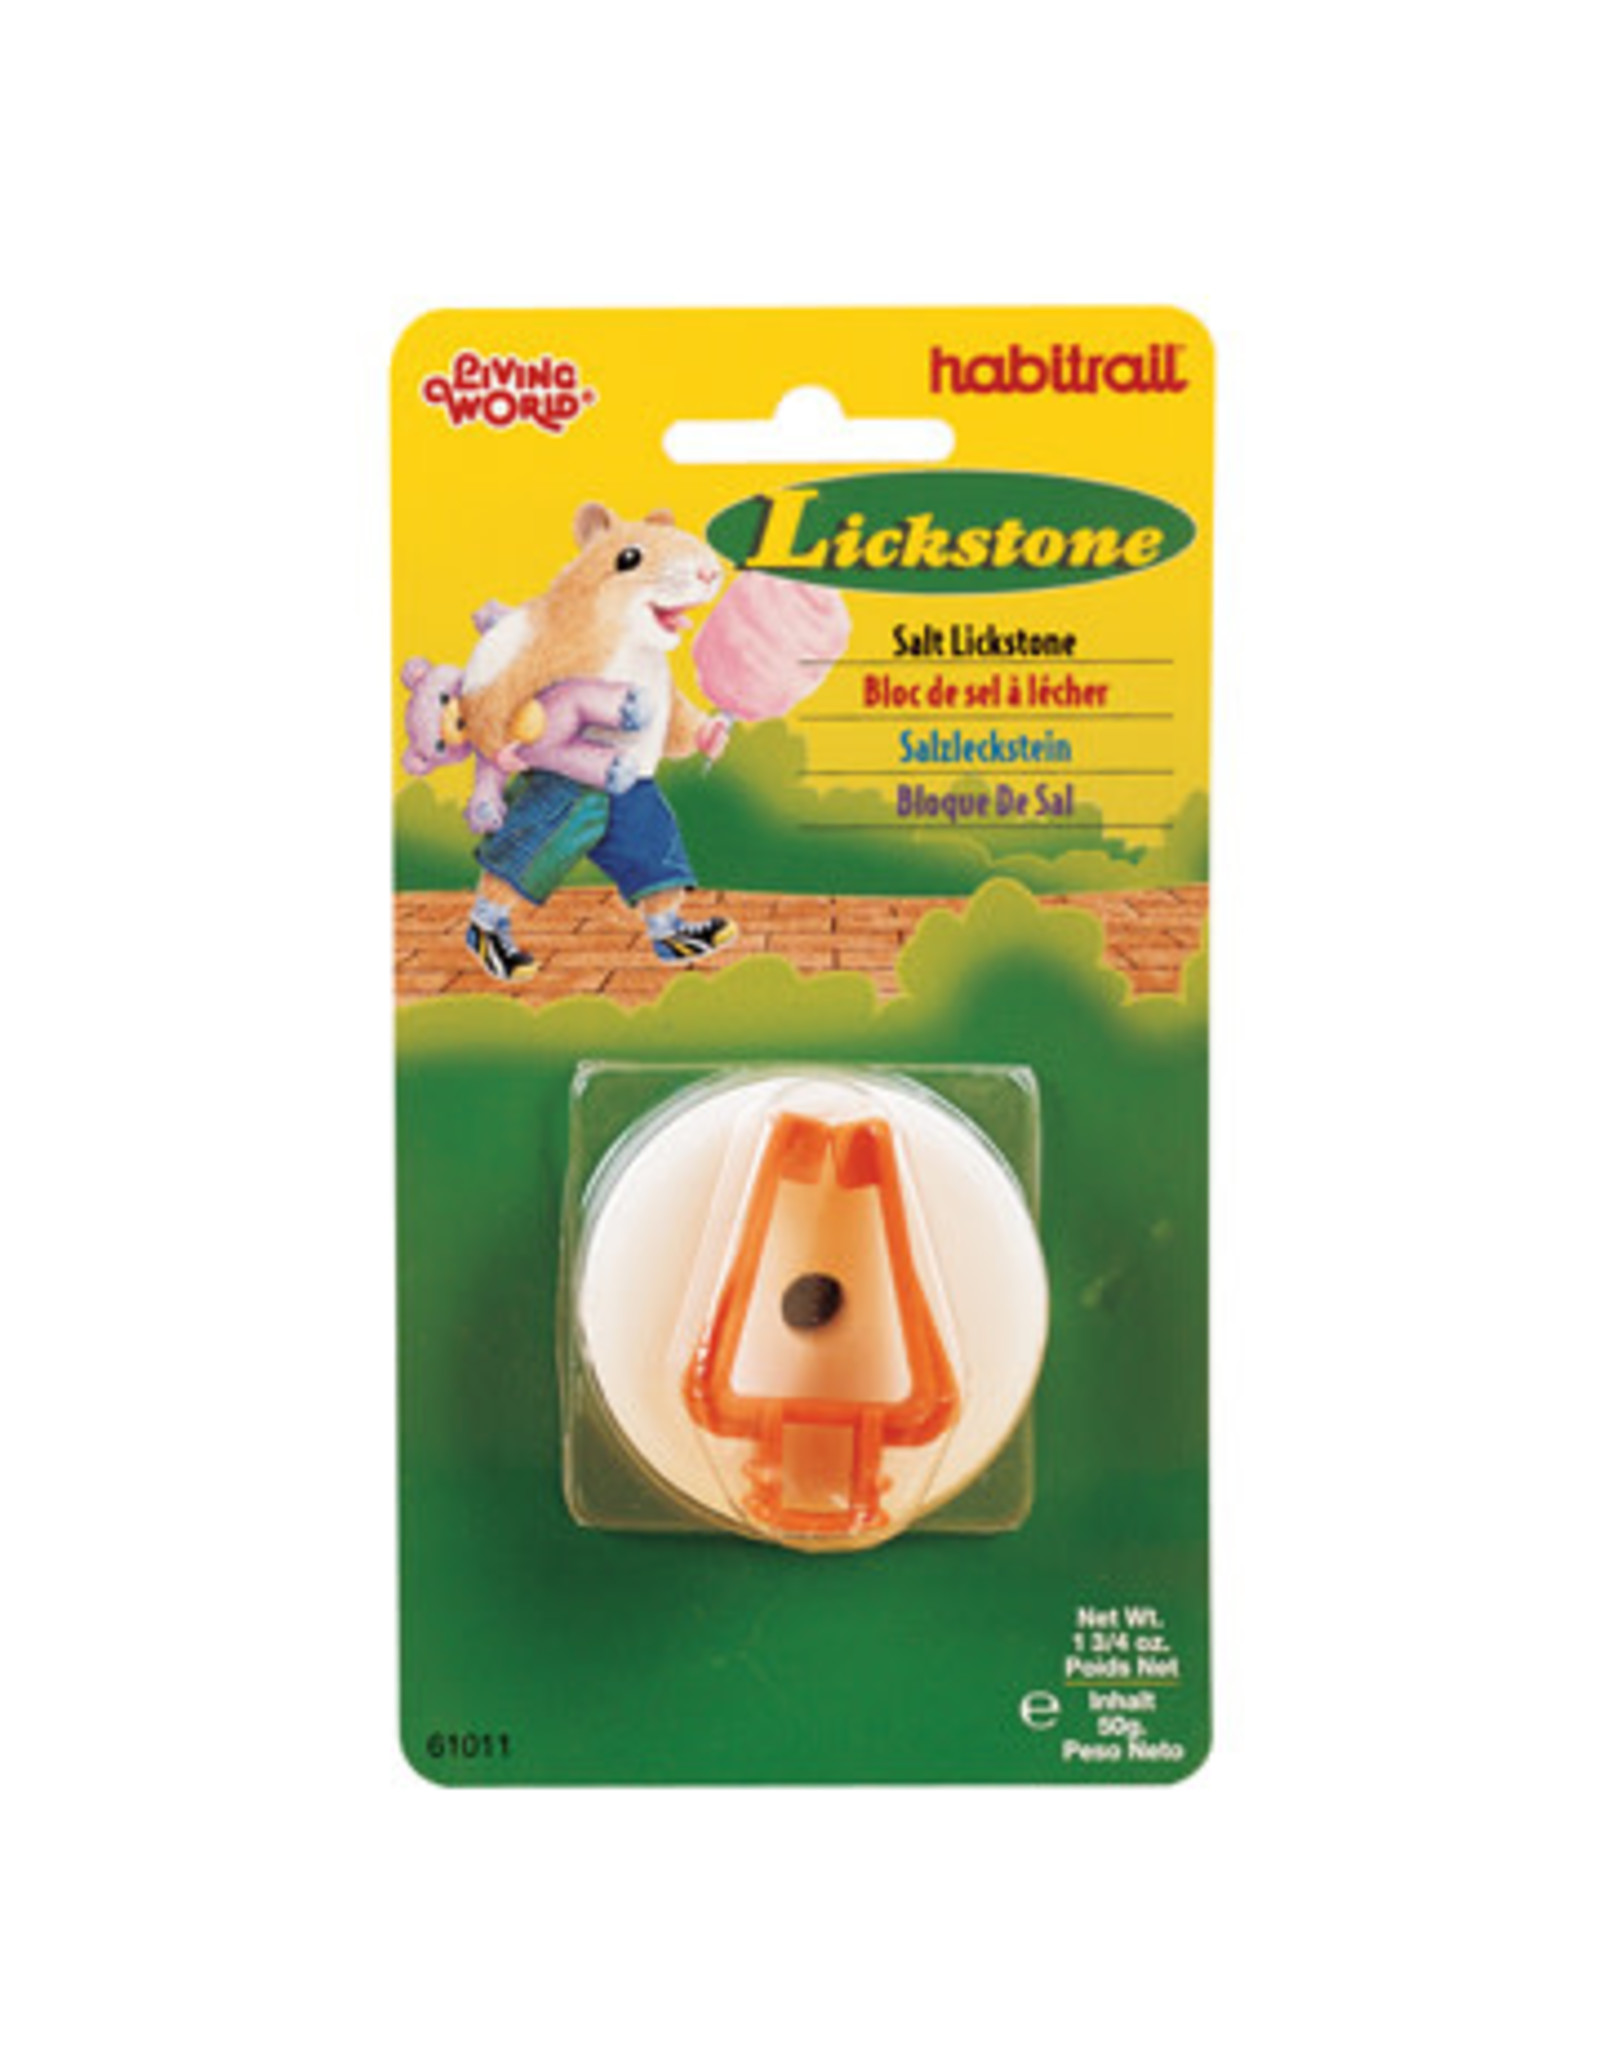 Living World Living World Hamster Salt and Mineral Lickstone - 50 g (1.8 oz)